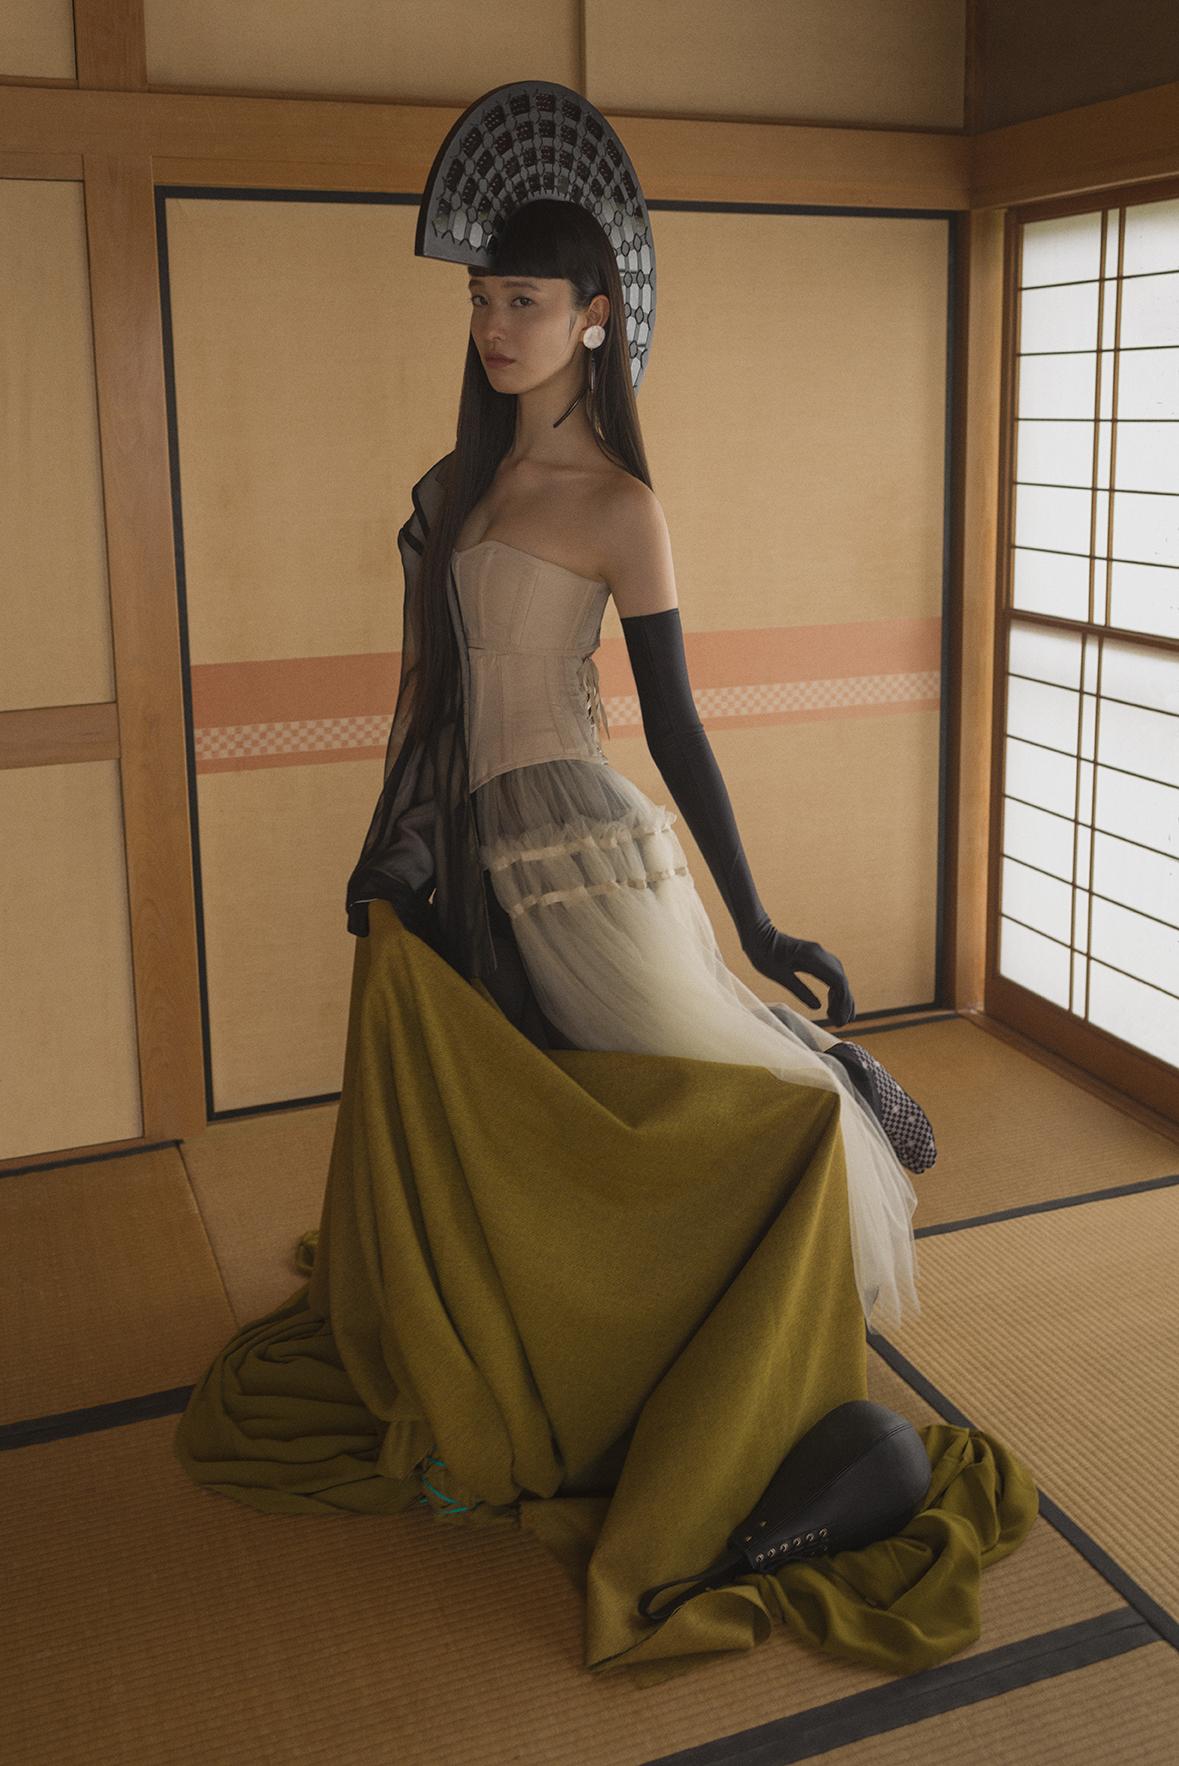 Vogue Italia - Demi Demu / Yuka Mannami